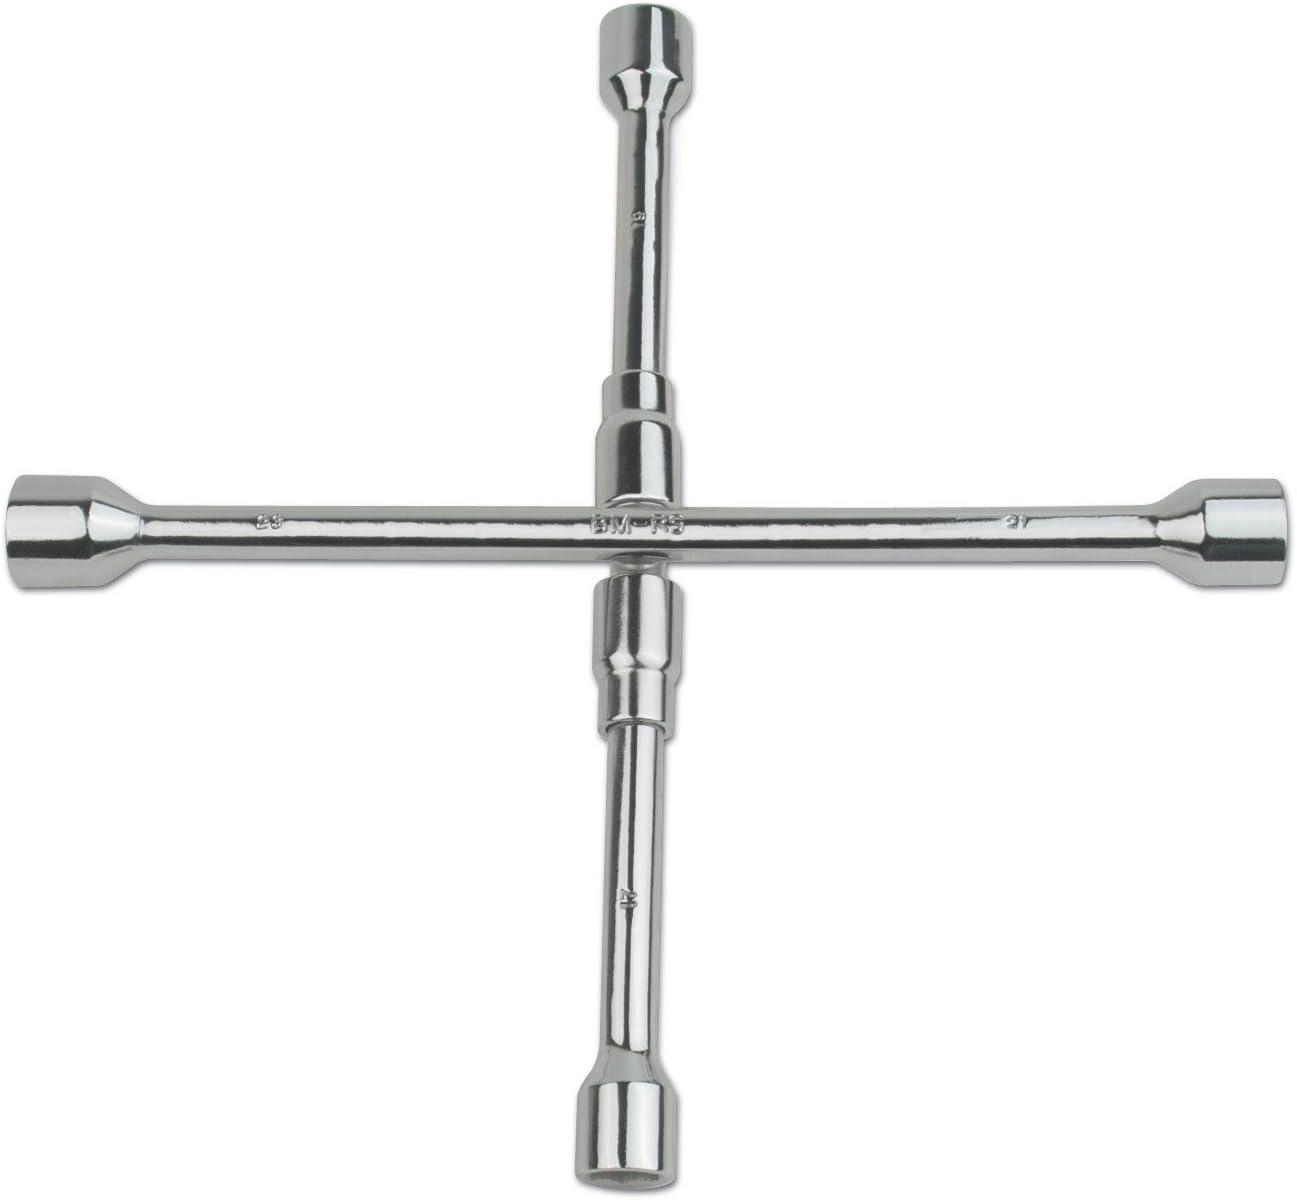 Mannesmann 16000 Folding Automobile X-Wheel Nut Wrench